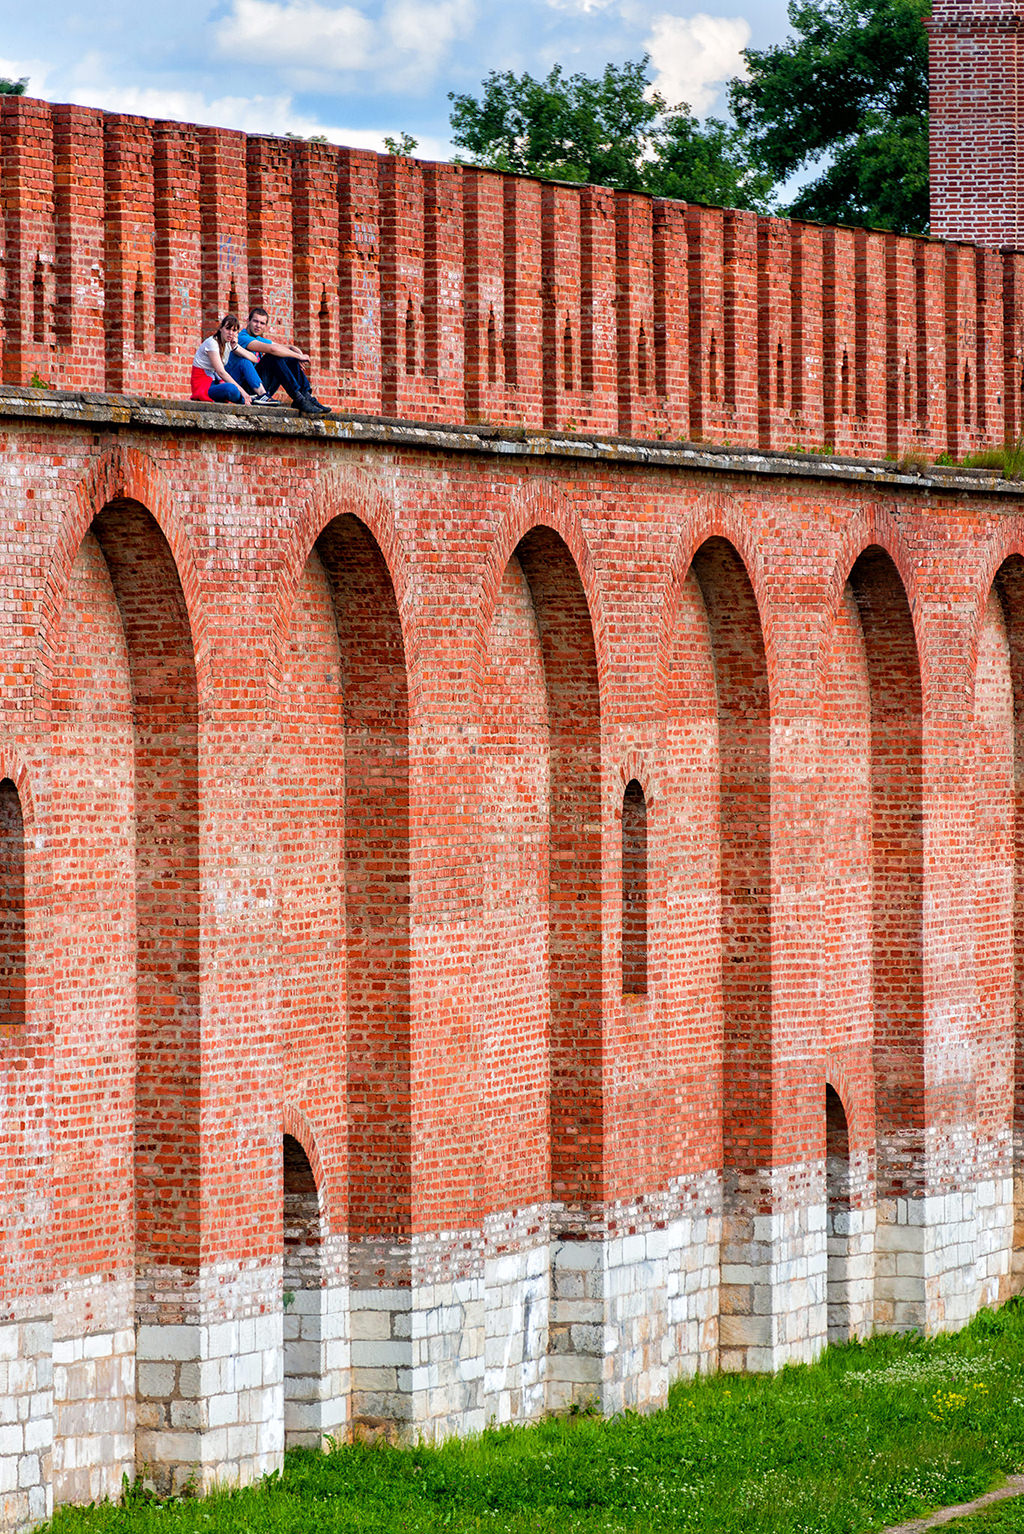 Smolensk wall, Russia